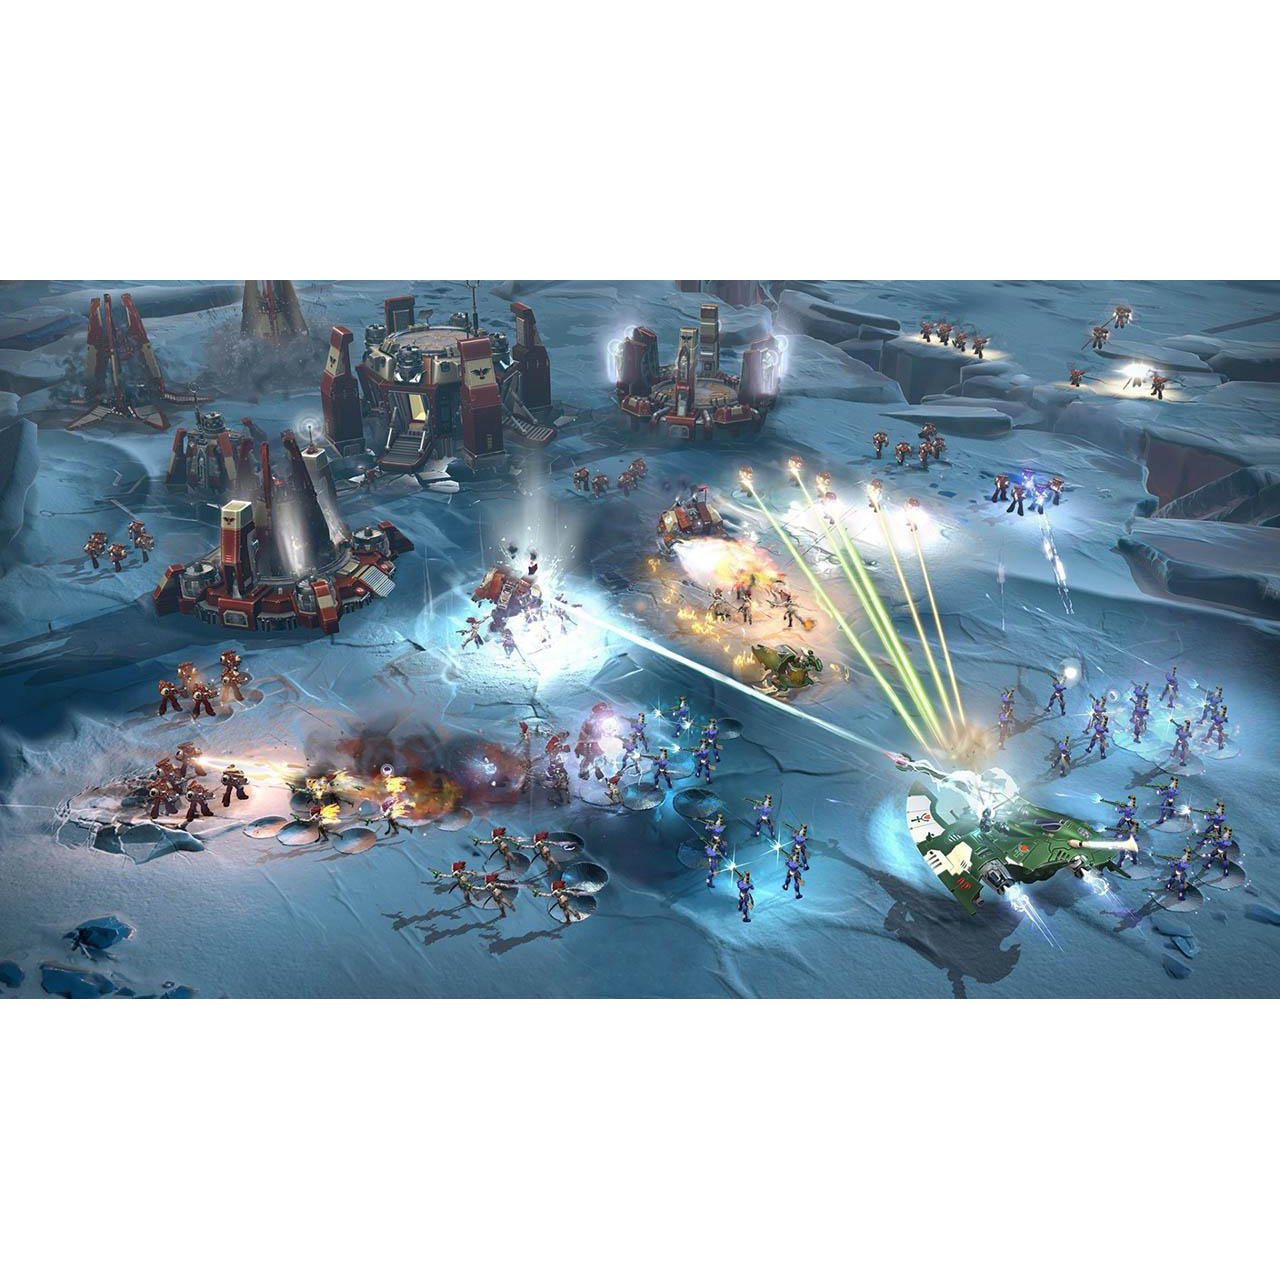 Joc Dawn of War 3 pentru PC 4